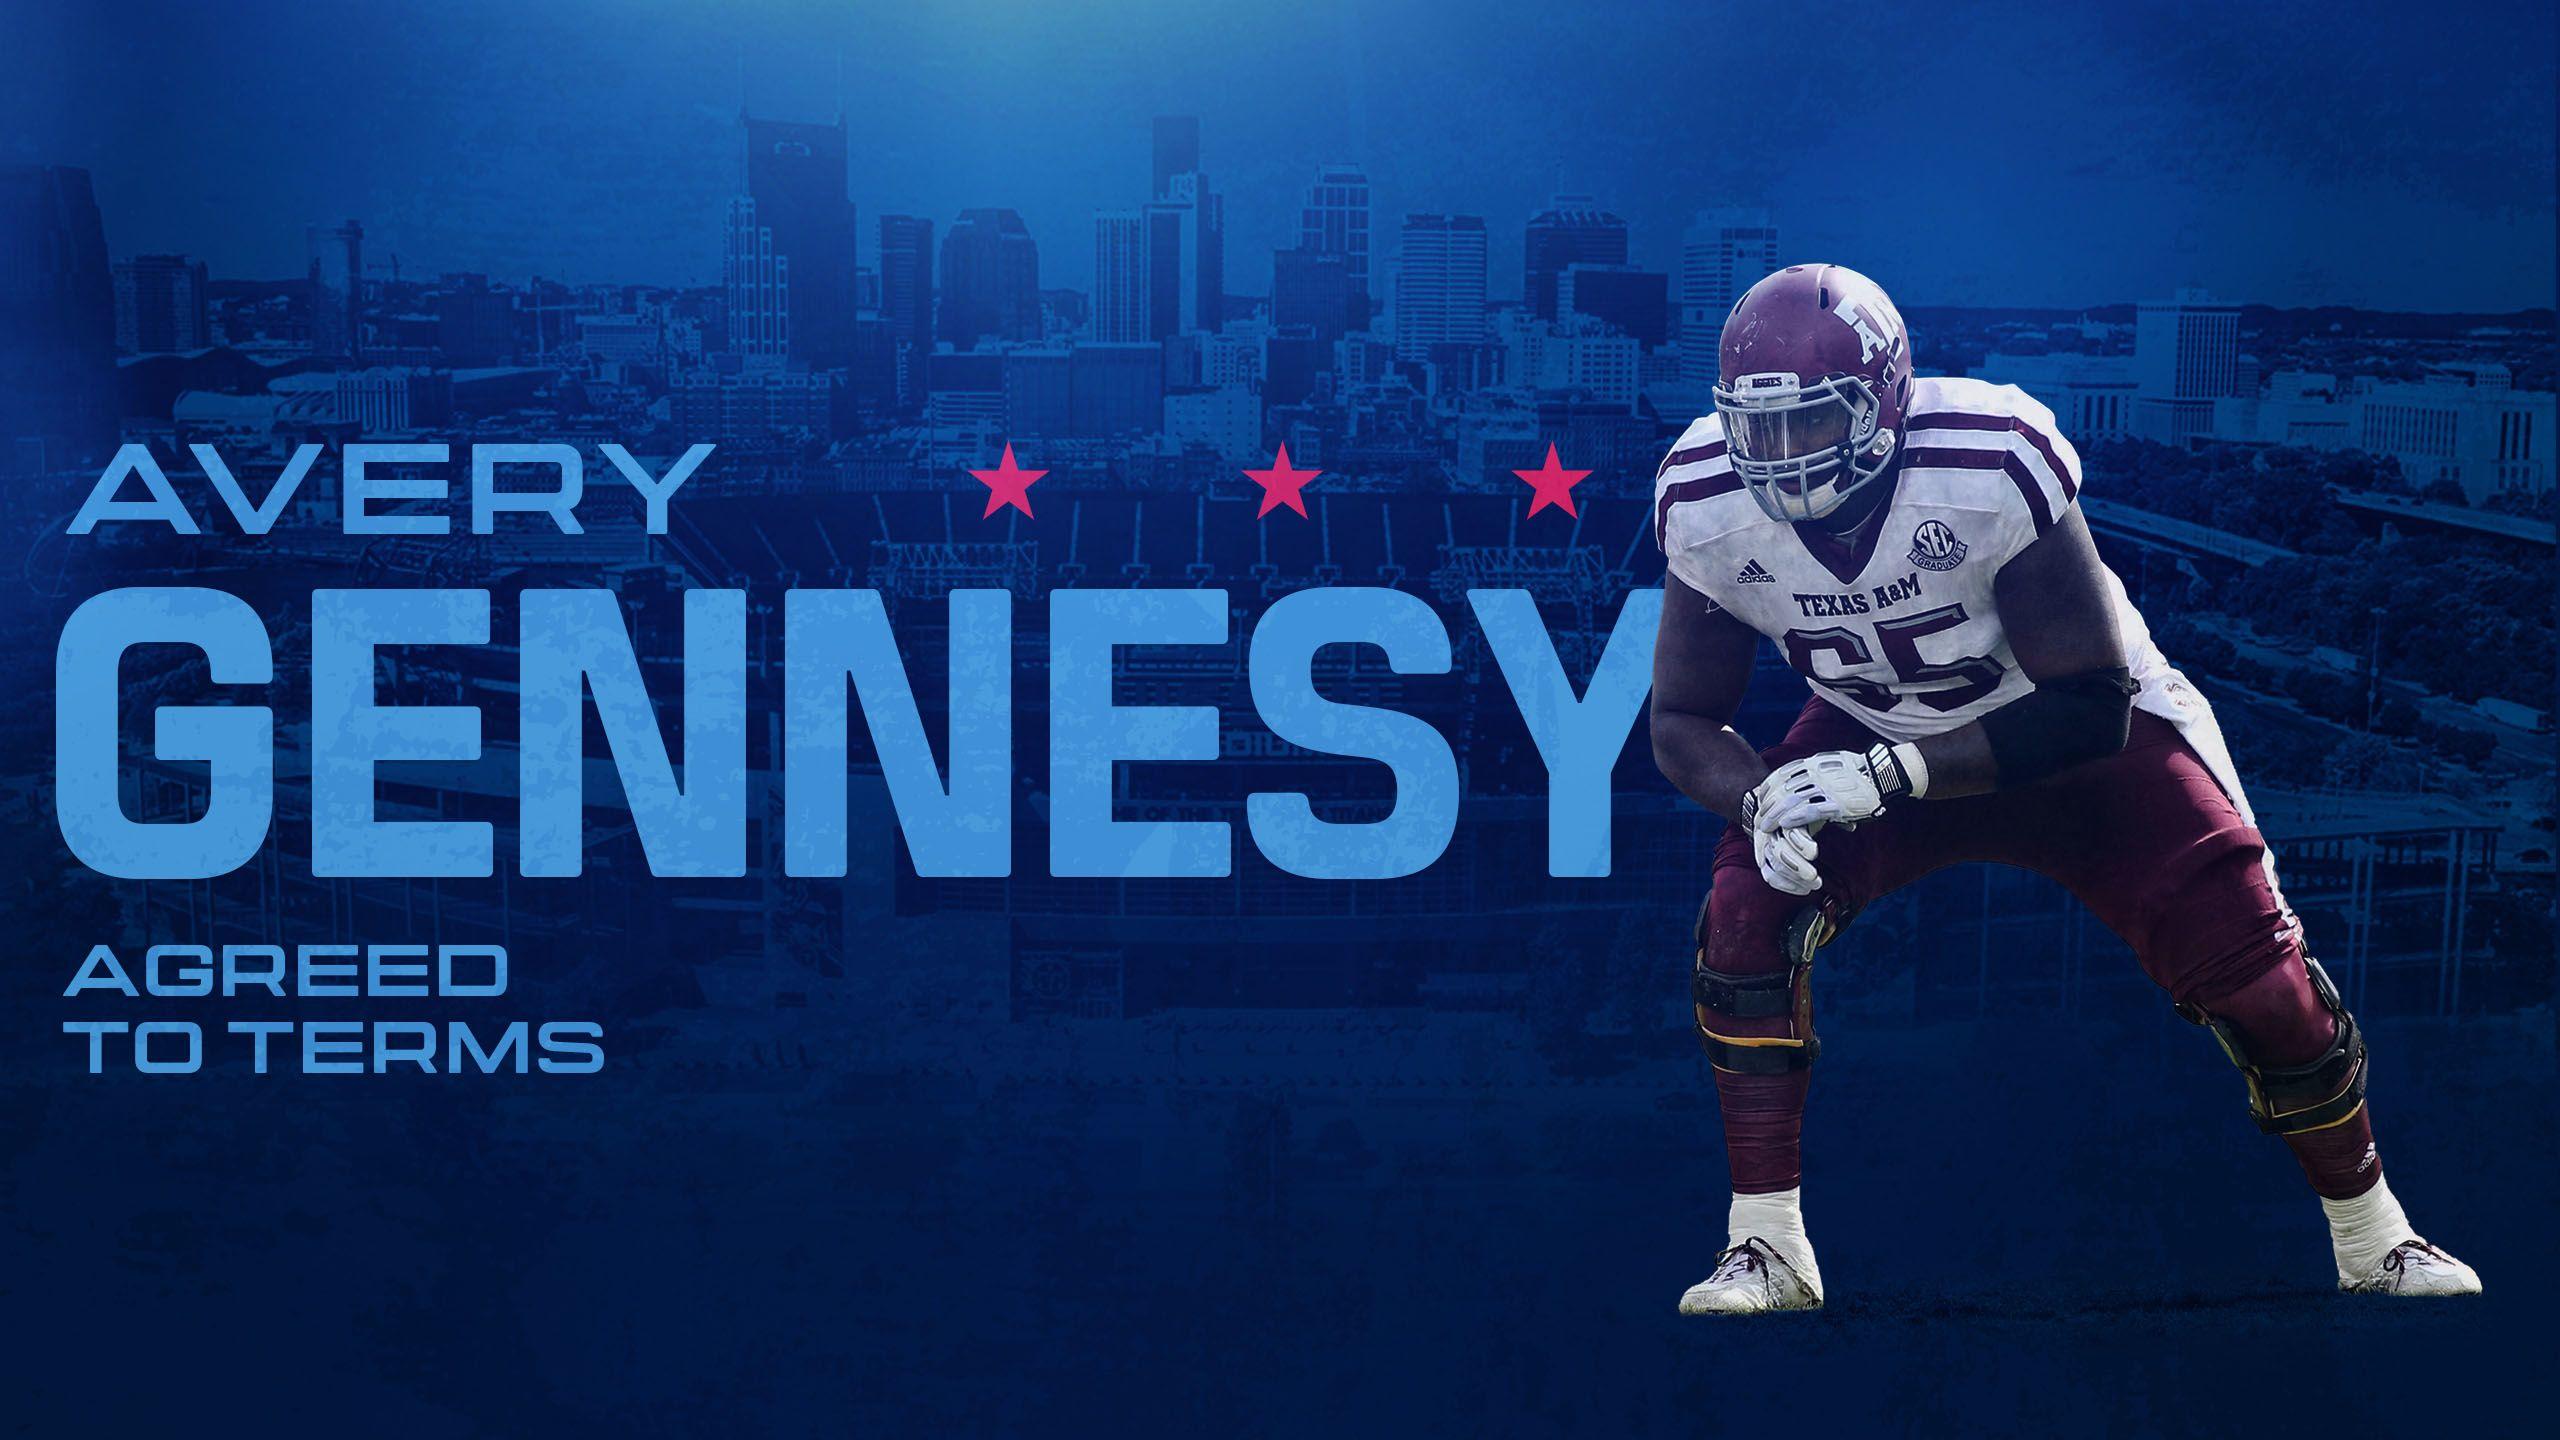 Avery Gennesy